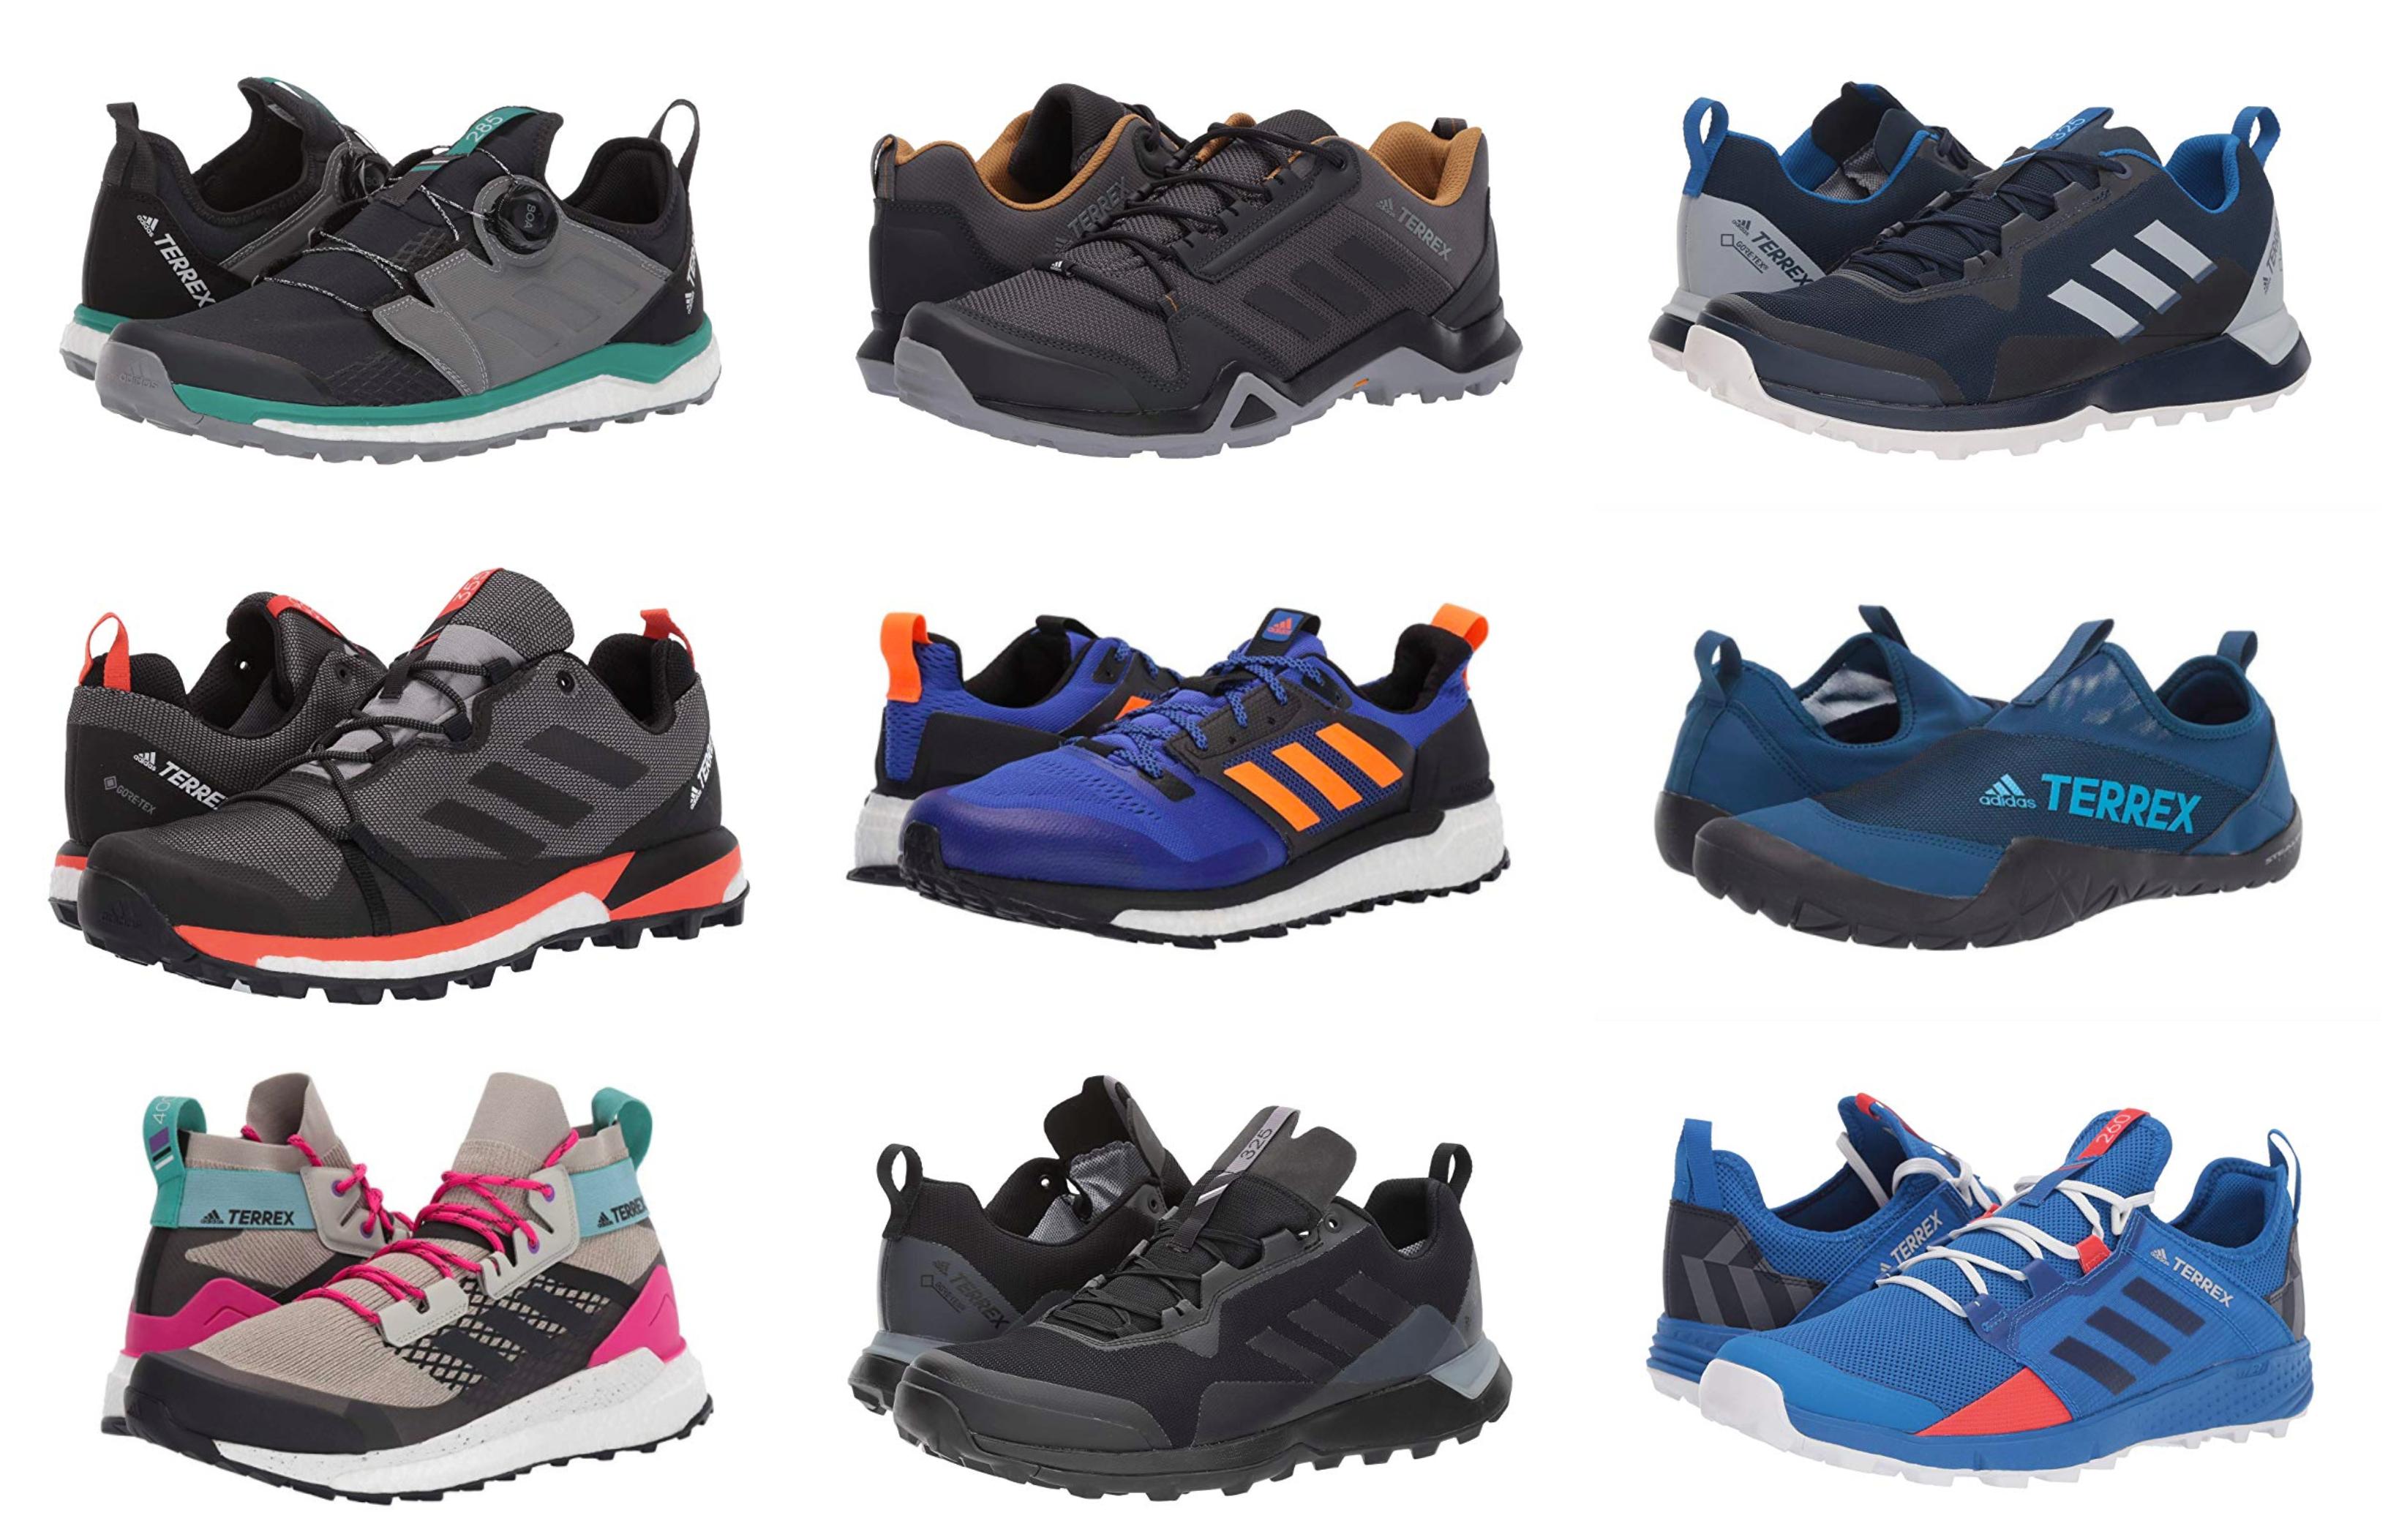 adidas trex chaussures torsion homme